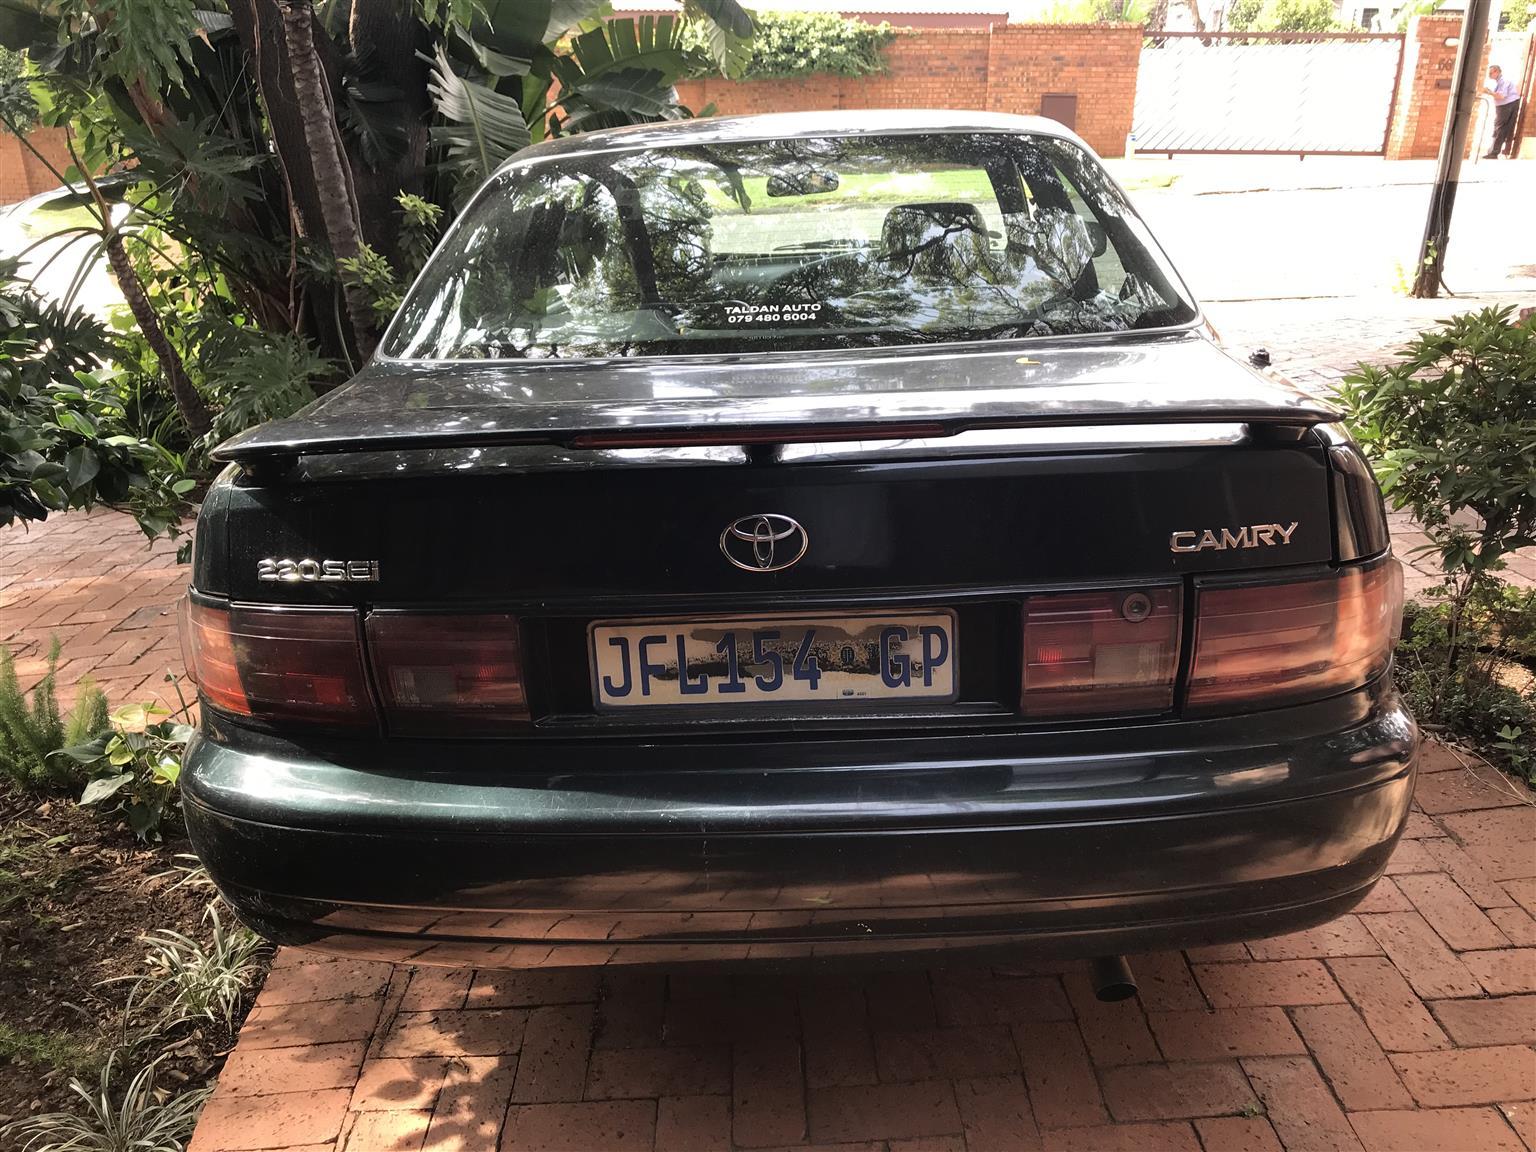 1996 Toyota Camry 2.4 XLi automatic